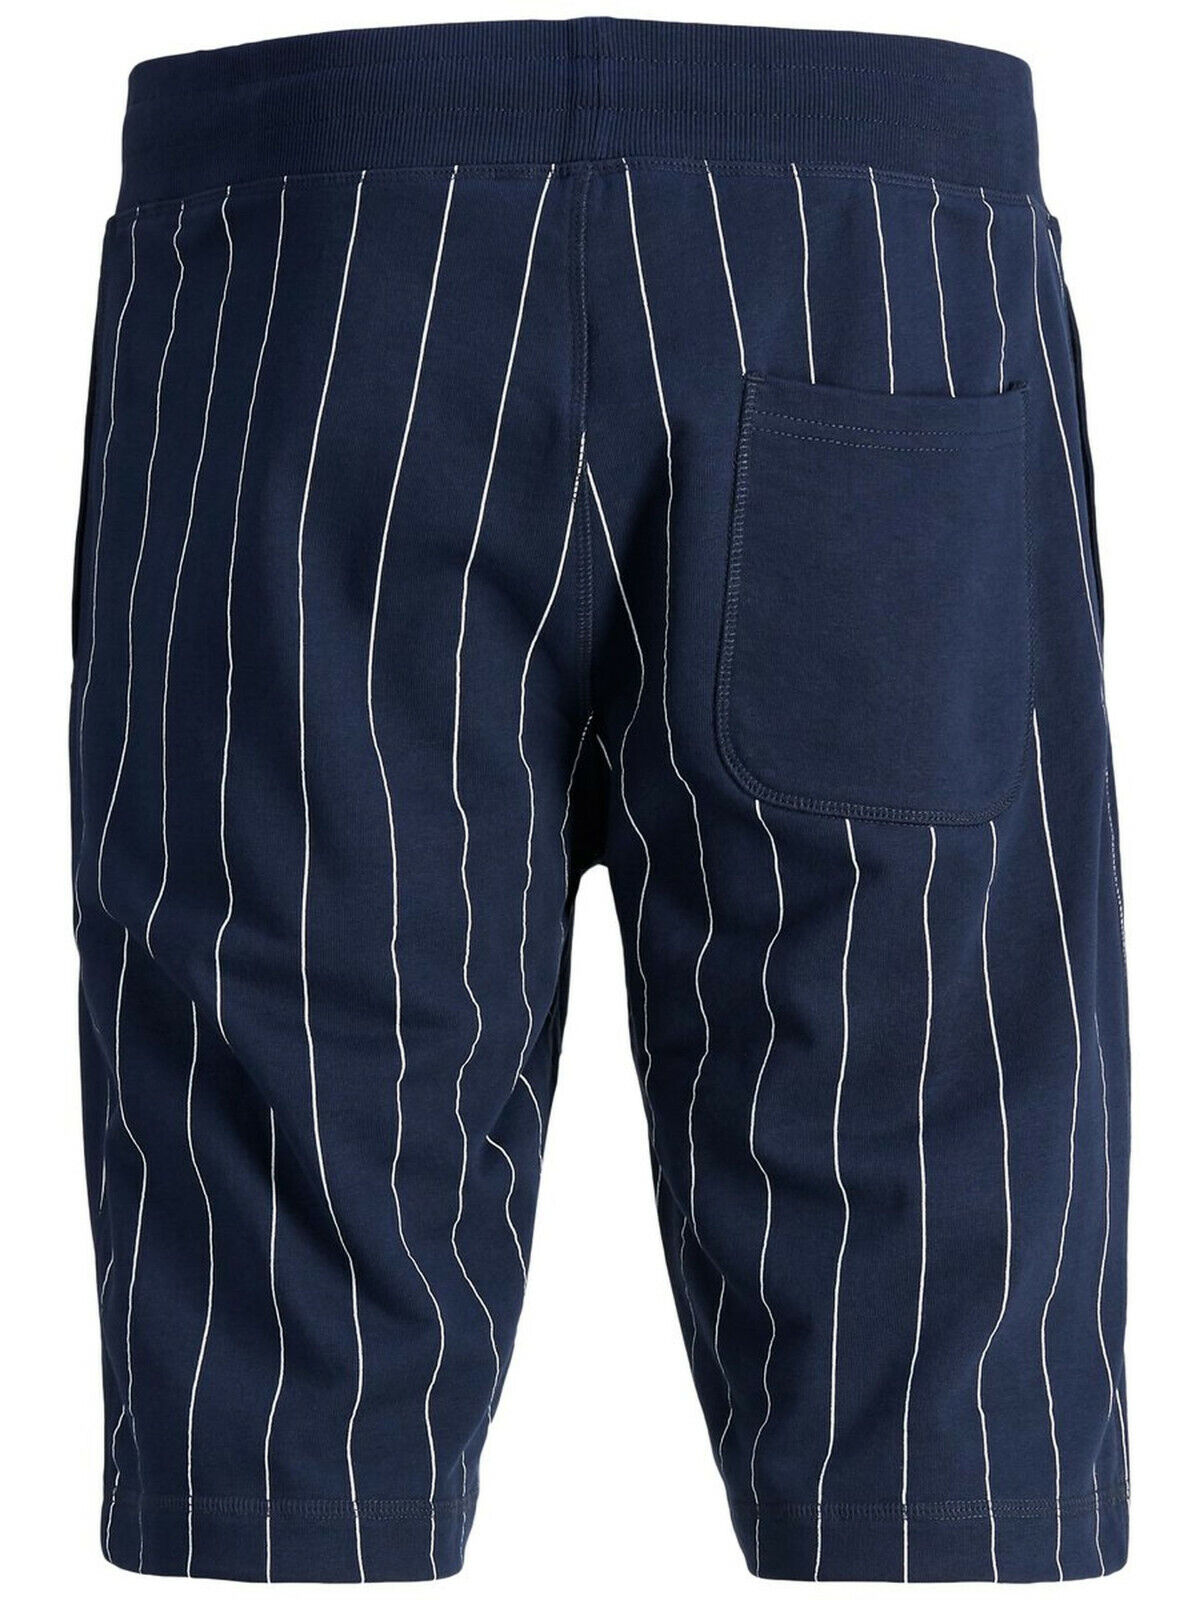 Mens Sweat Gym Pants Intelligence Shorts Pin Stripe Jack /& Jones JJIPinstripe